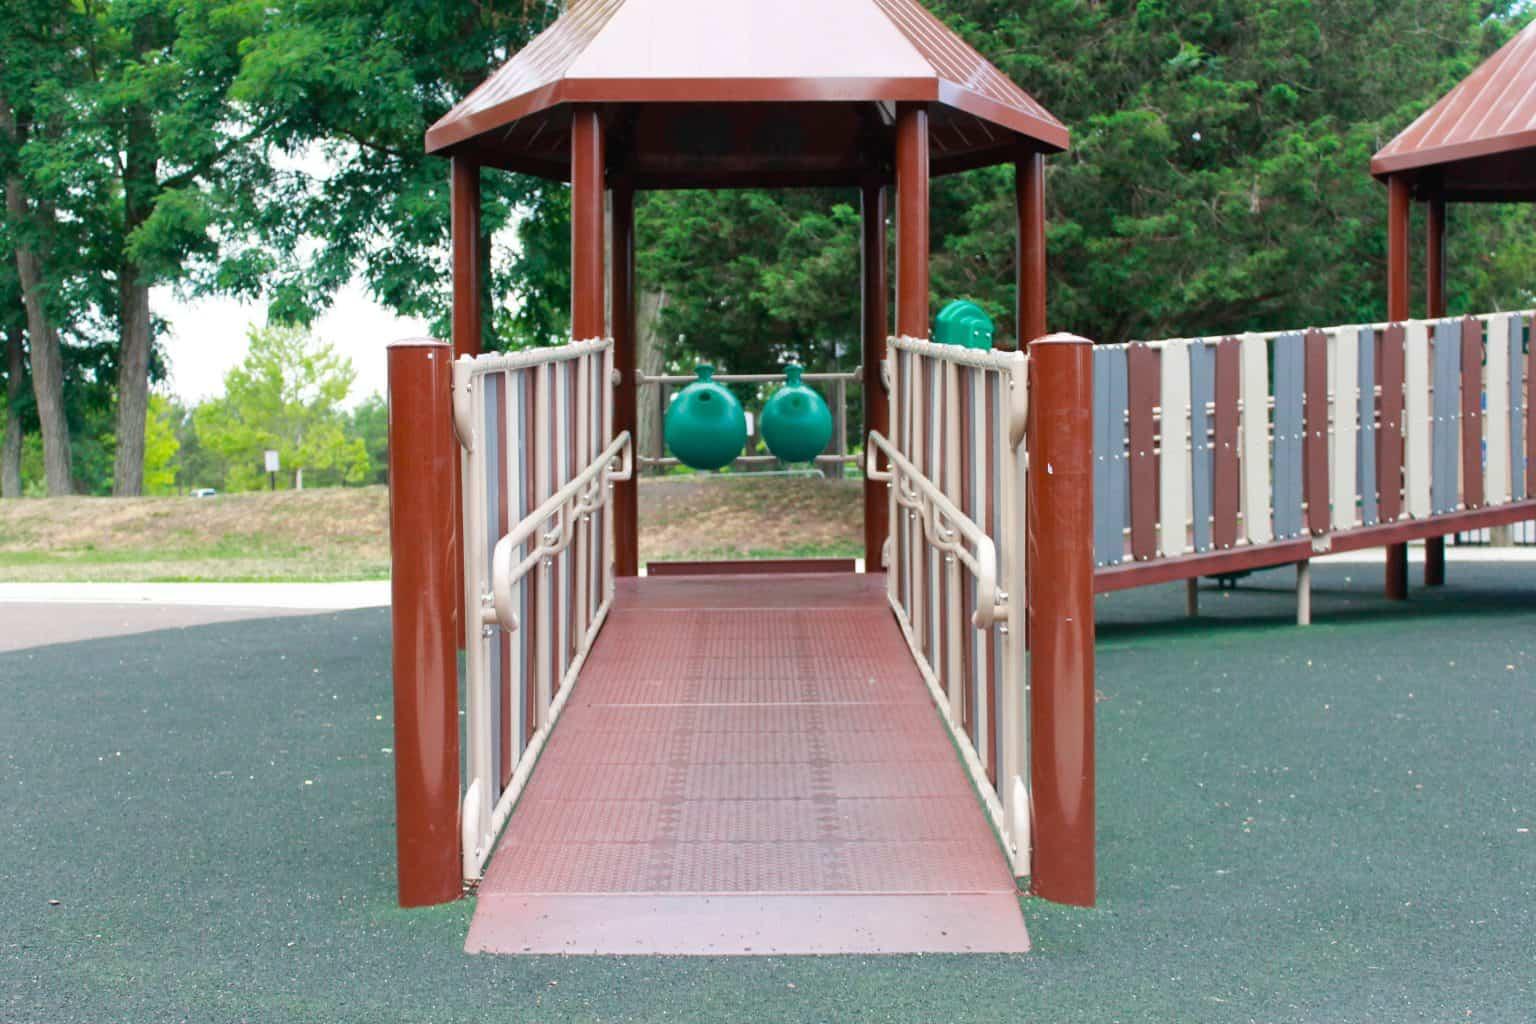 windward-beach-park-playground-brick-nj_27651421333_o-1536x1024